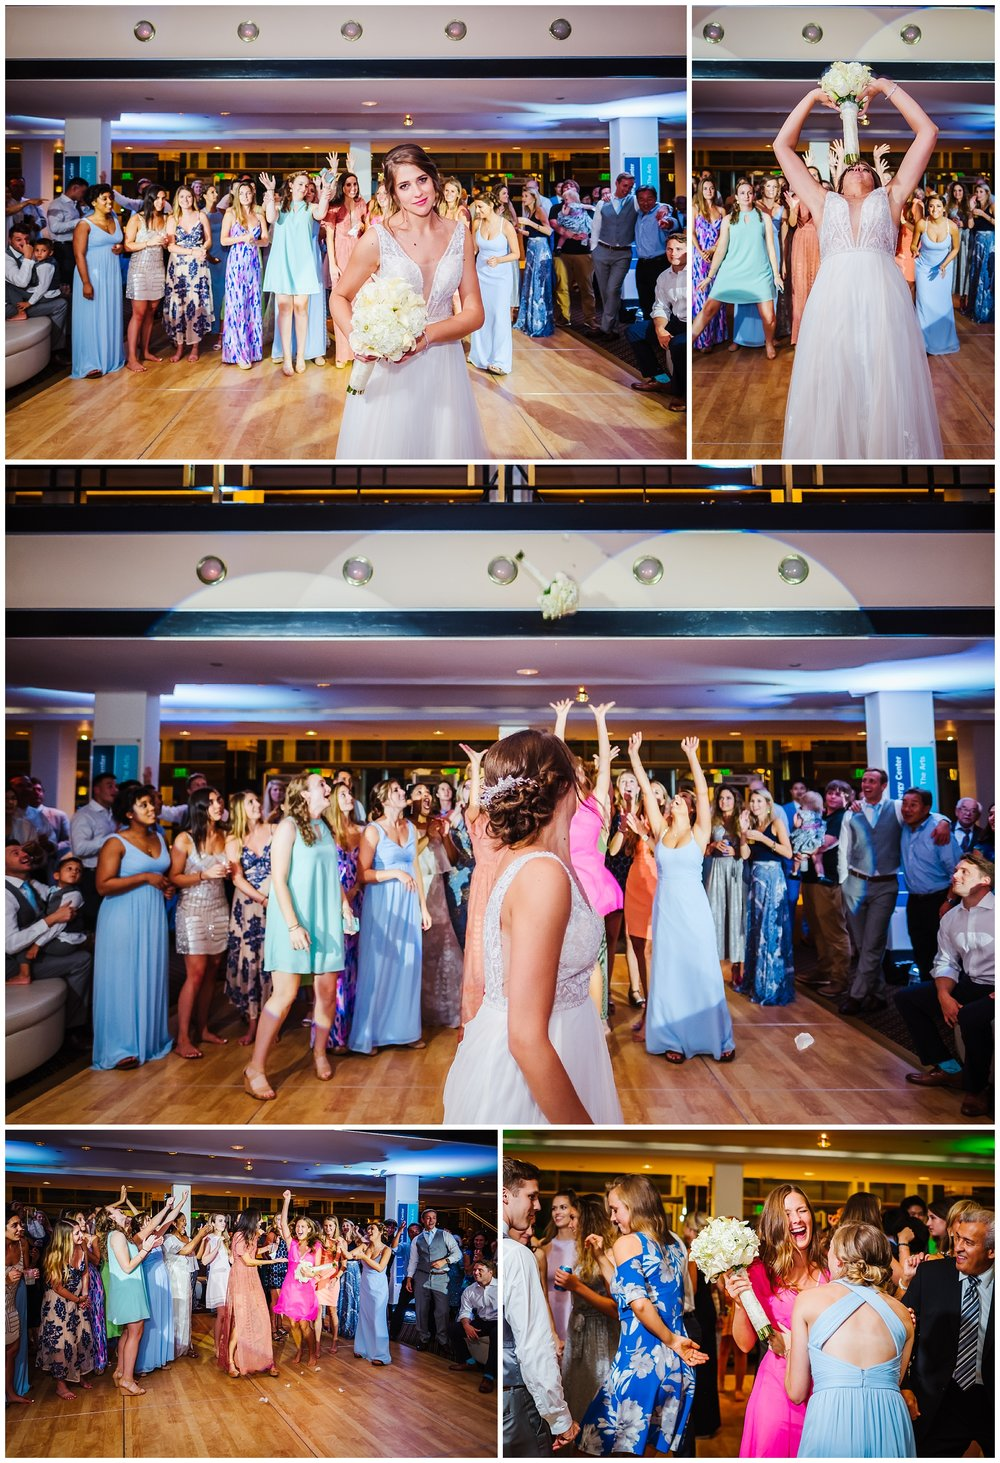 mahaffey-theater-big-military-wedding-st-pete-photographer-blue_0105.jpg